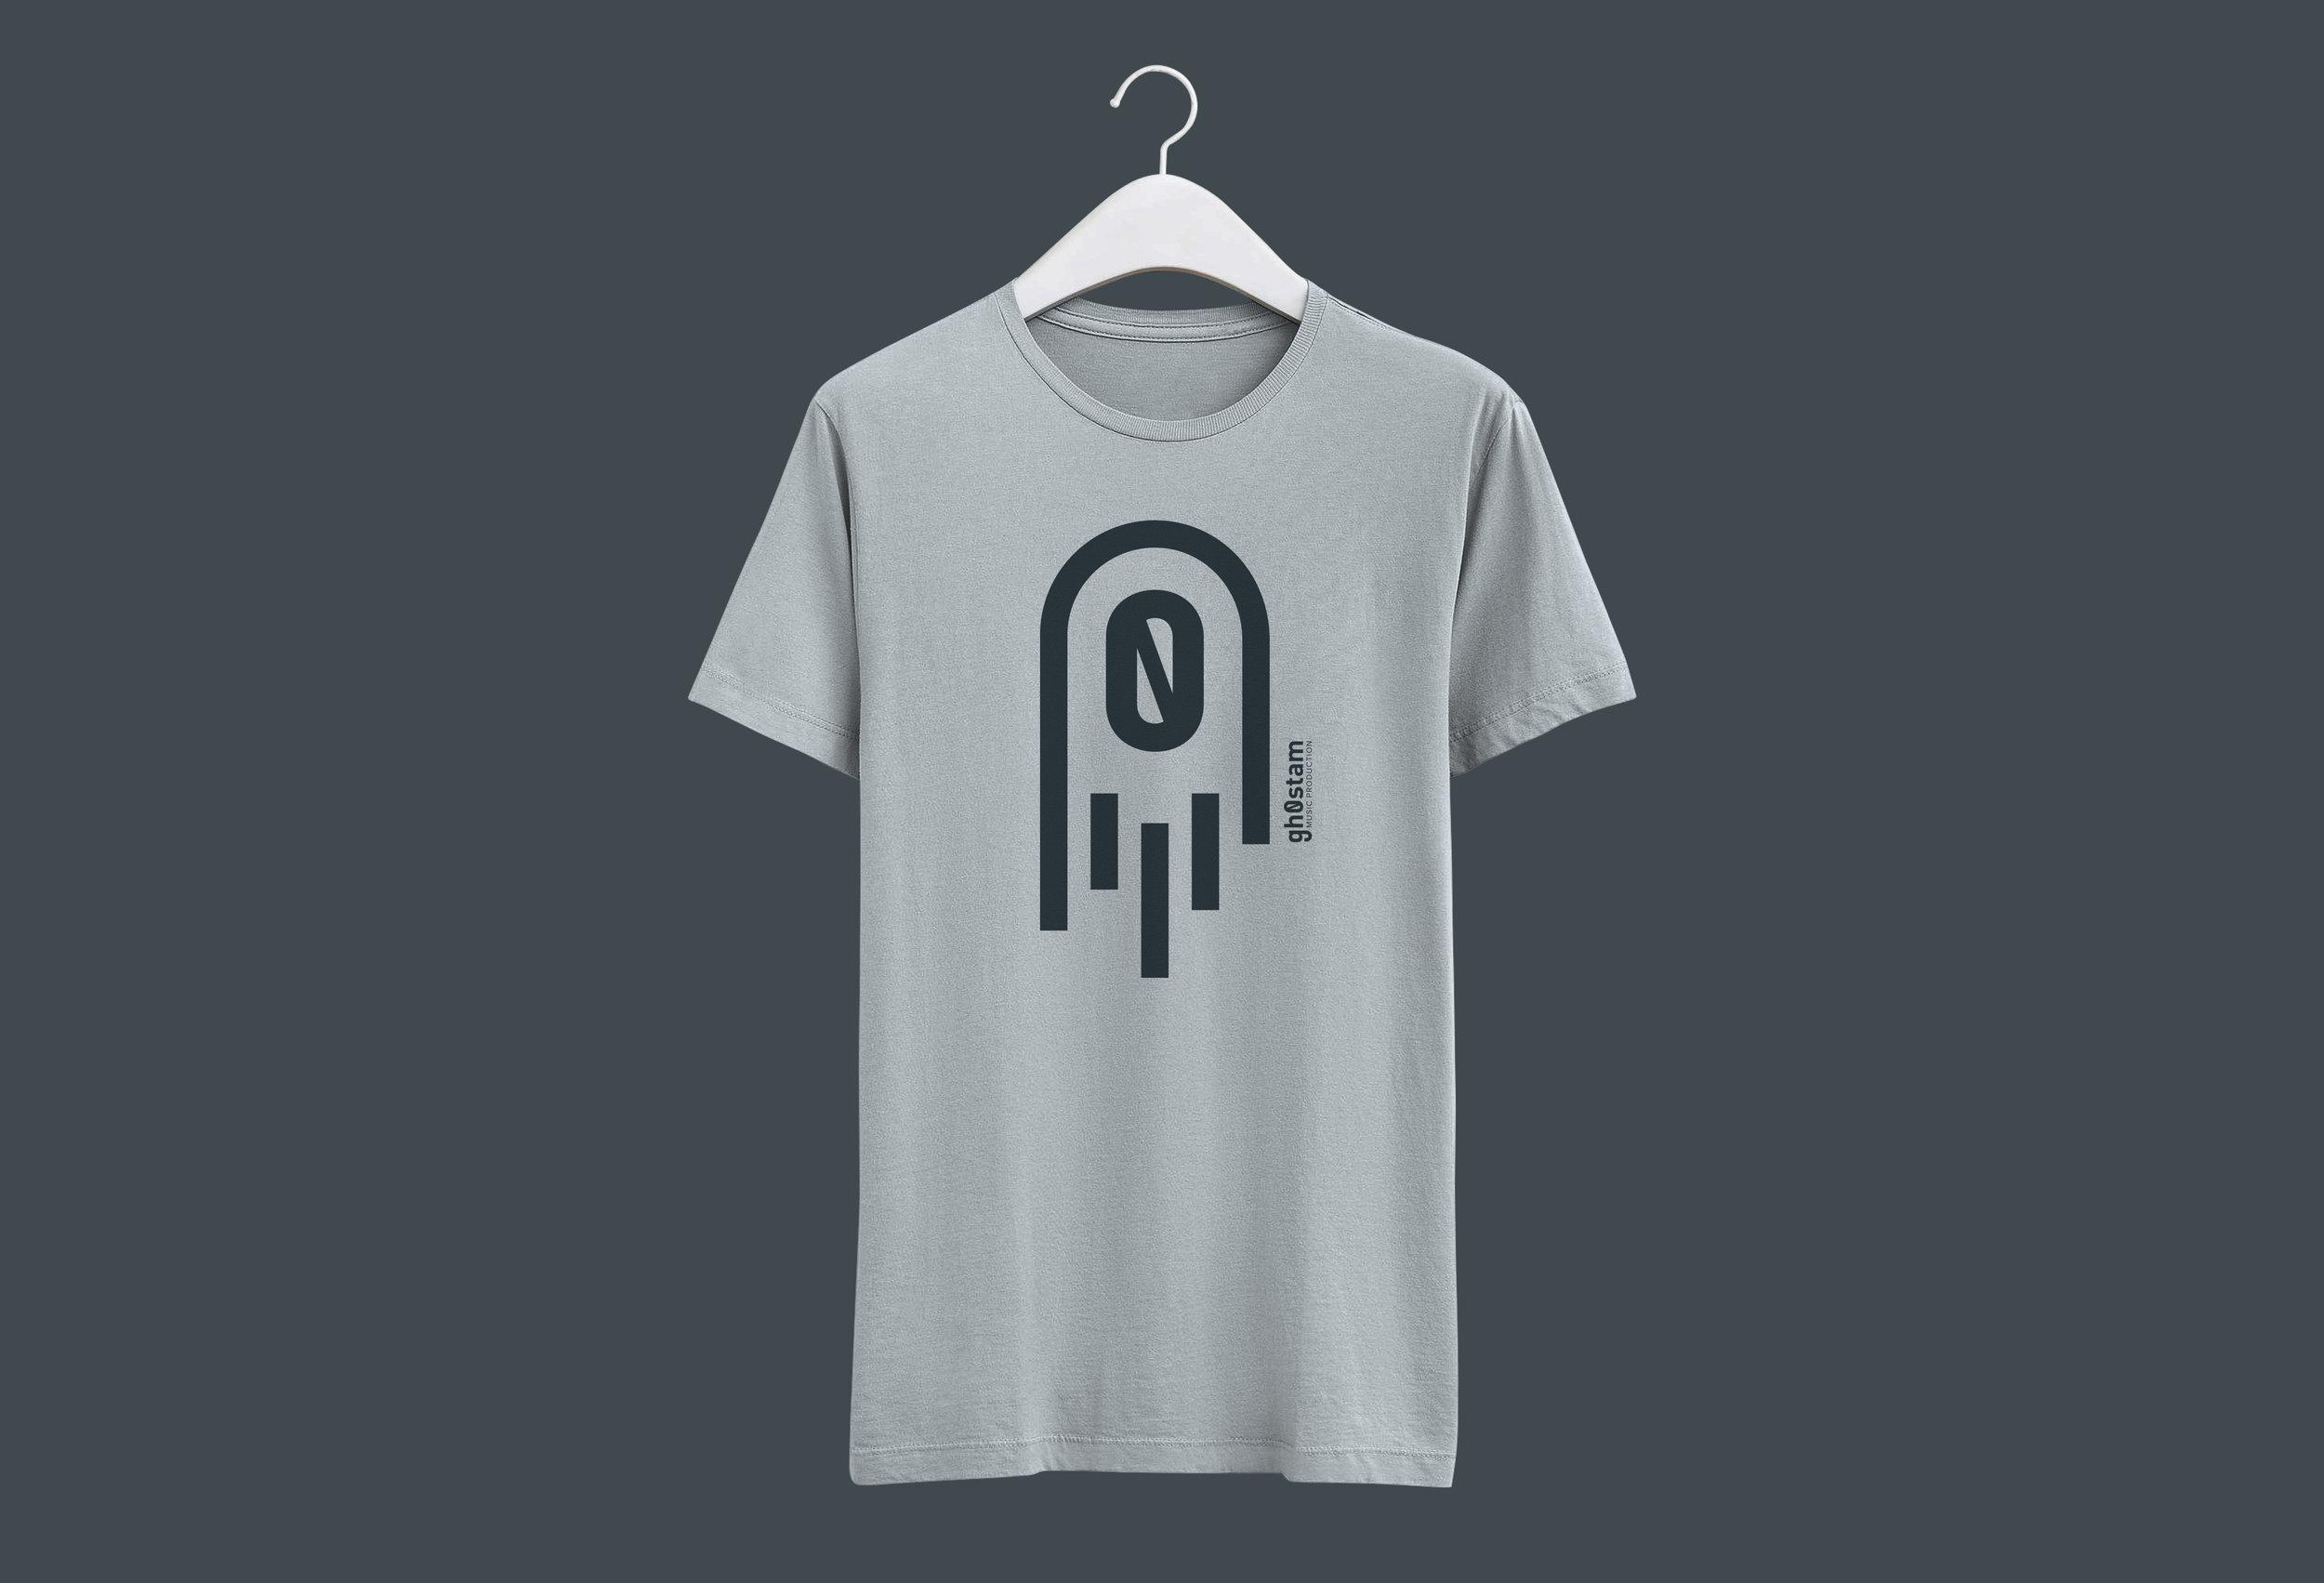 Gh0stam-shirt-Mockup-Front.jpg